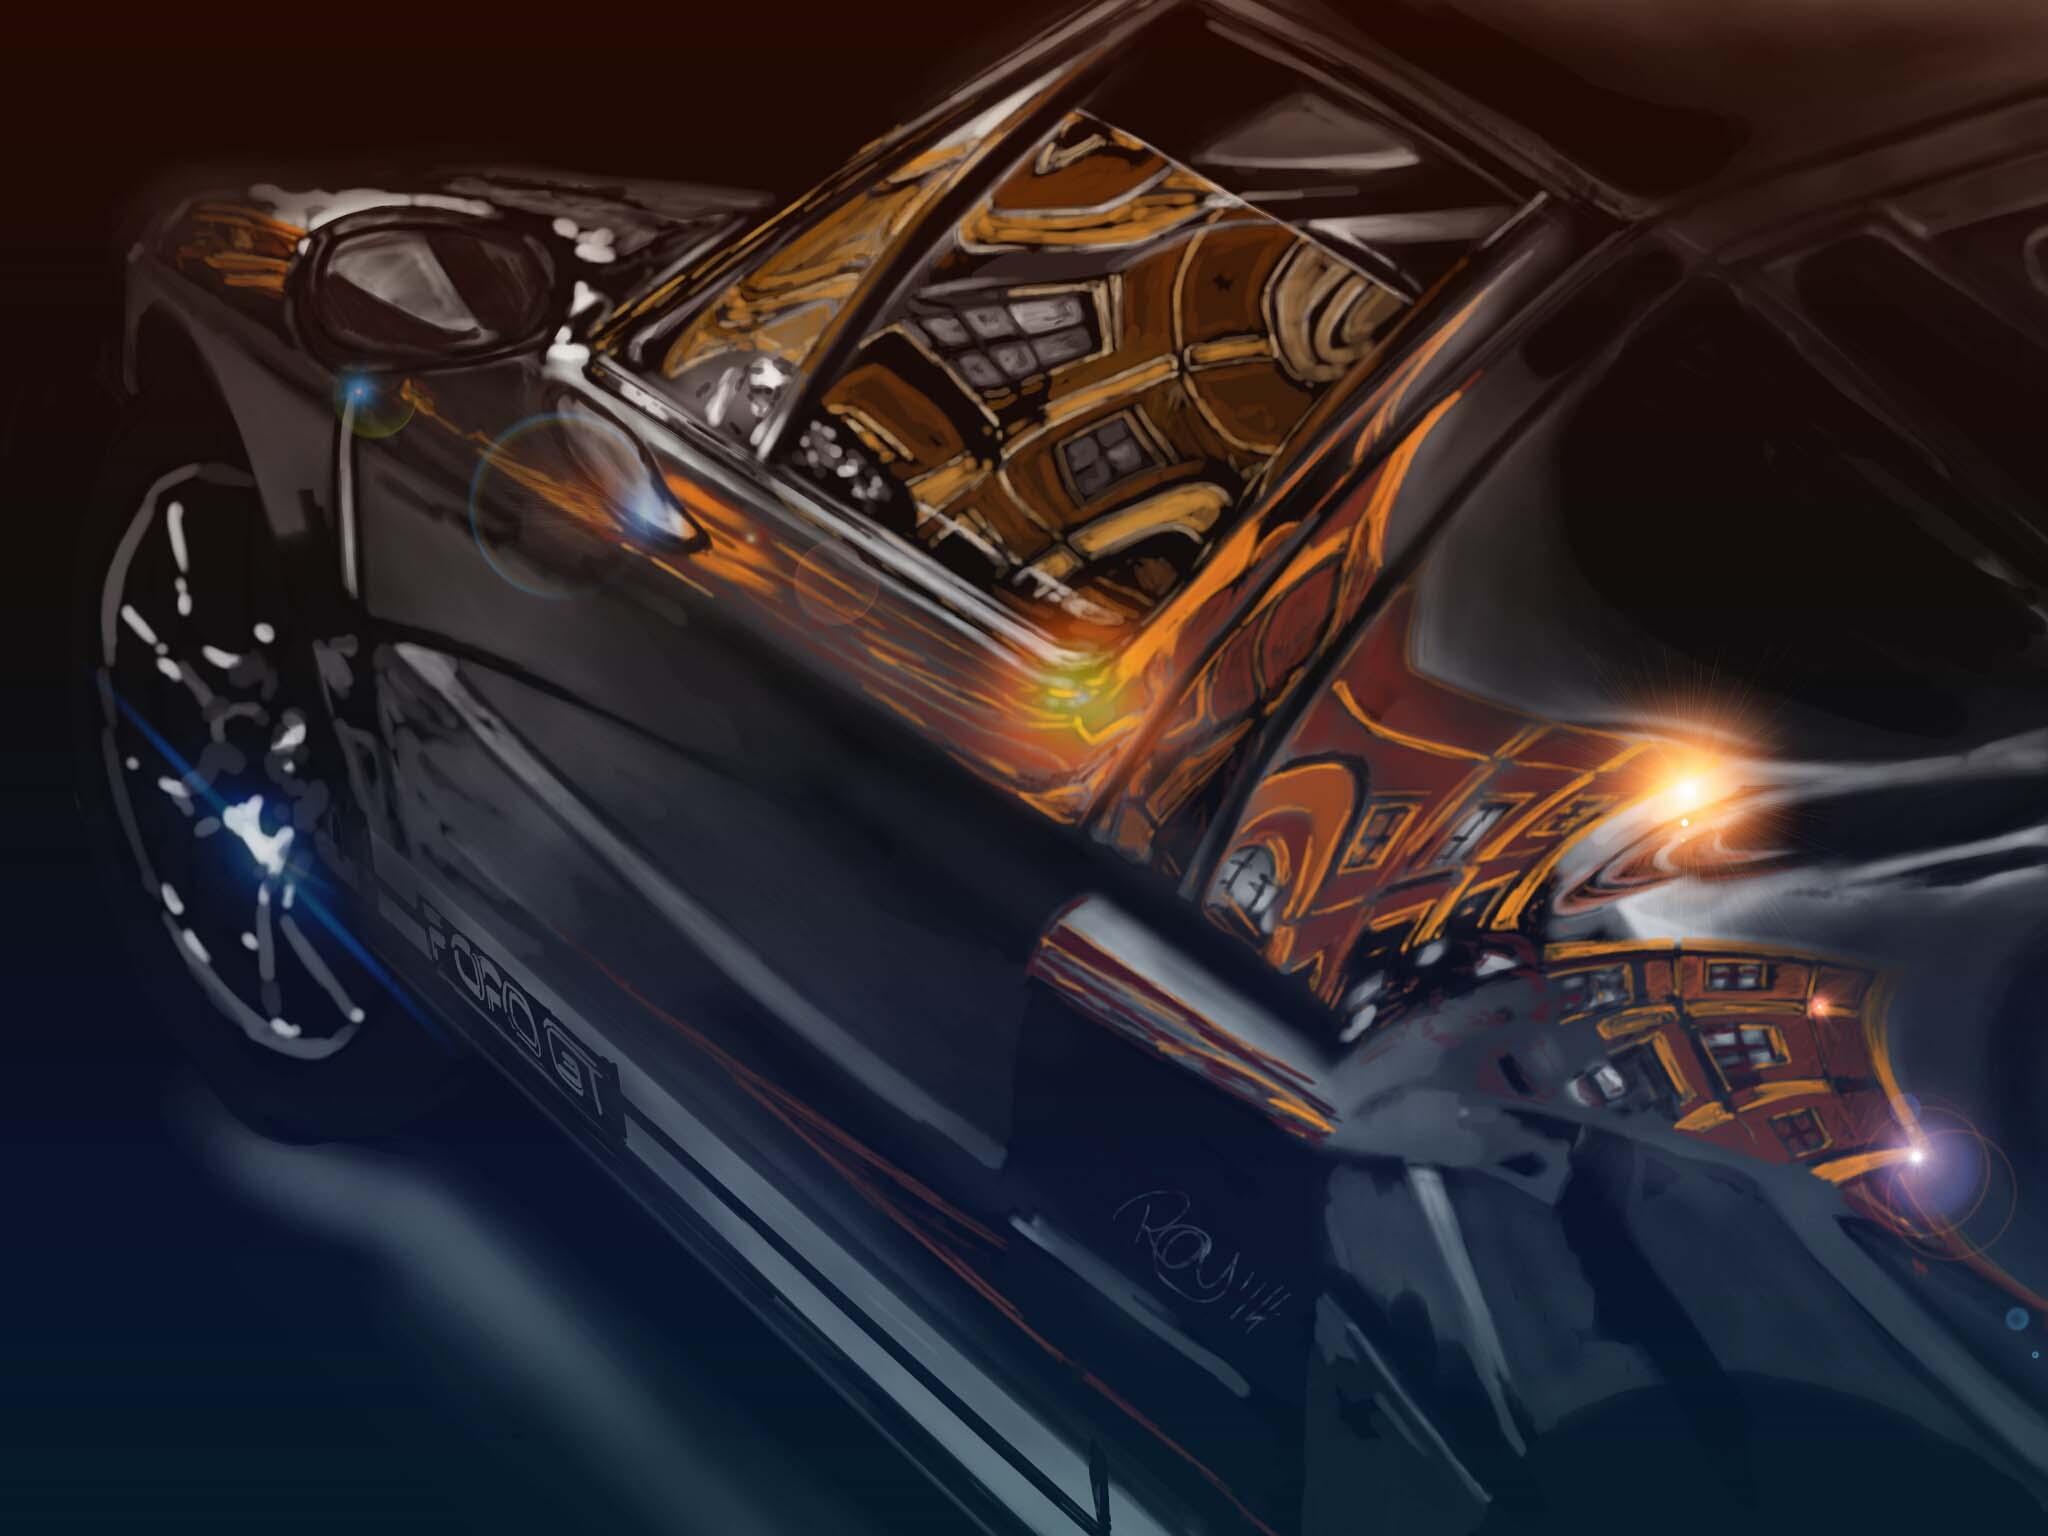 Ford Gt digital art